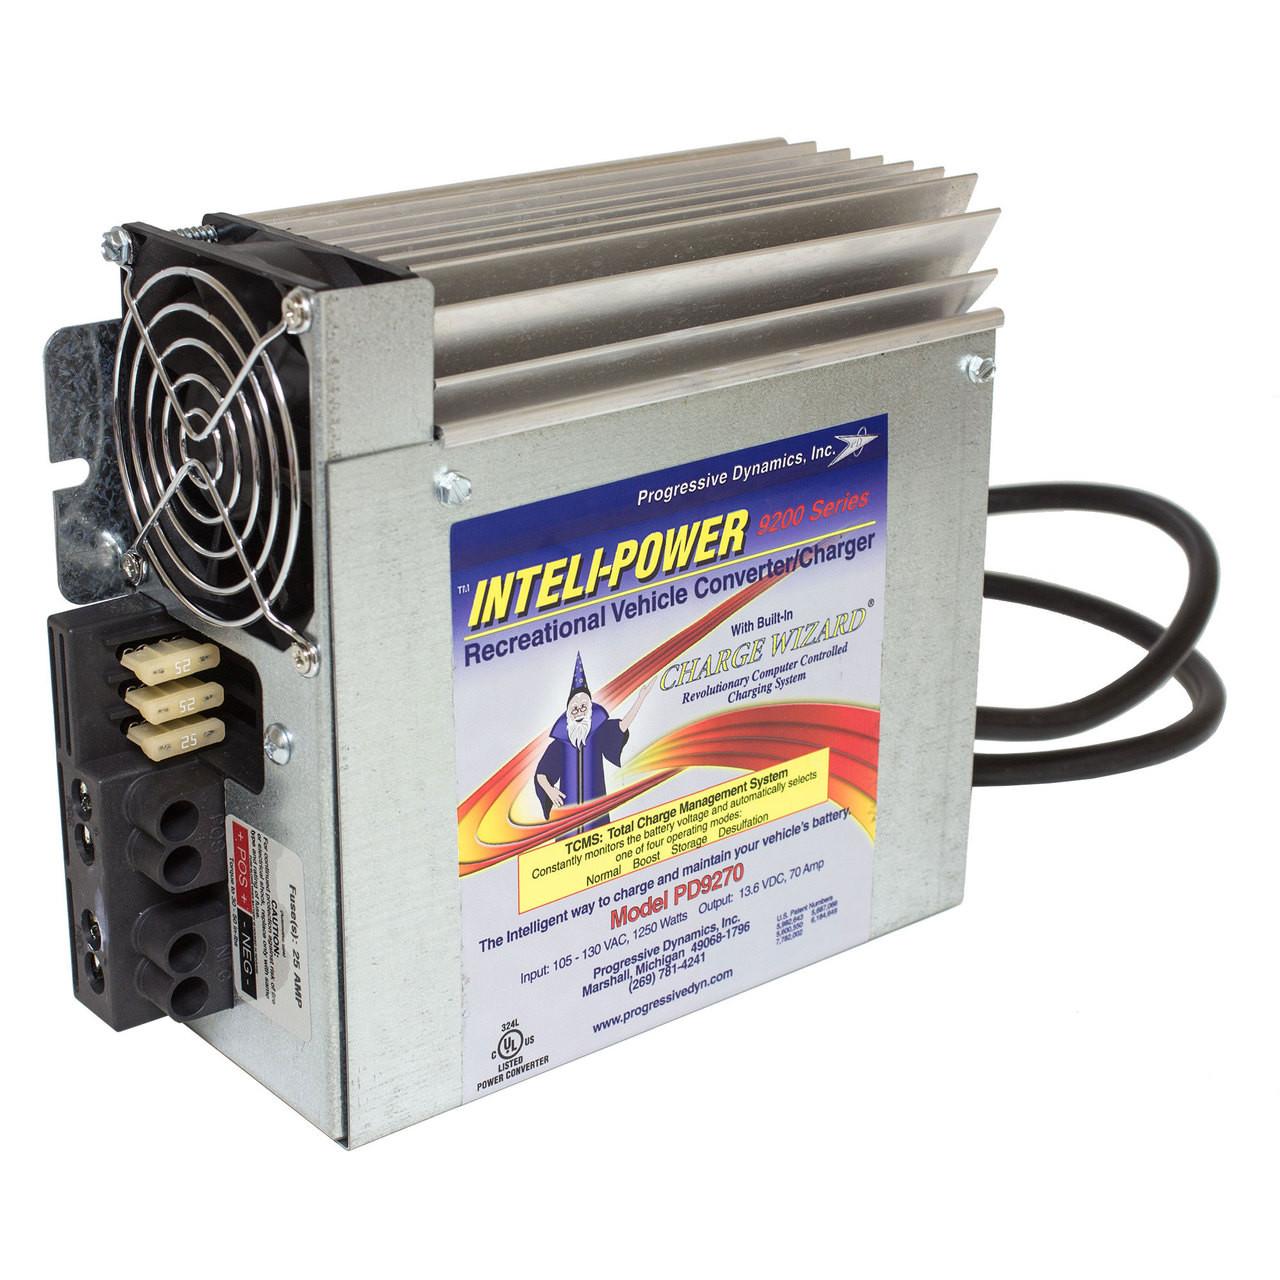 Intelli Power Converter Wiring Diagram - Wiring Diagram Expert on trailer wiring diagram, progressive dynamics pd 5500, rv wiring diagram, 8n 12 volt wiring diagram,